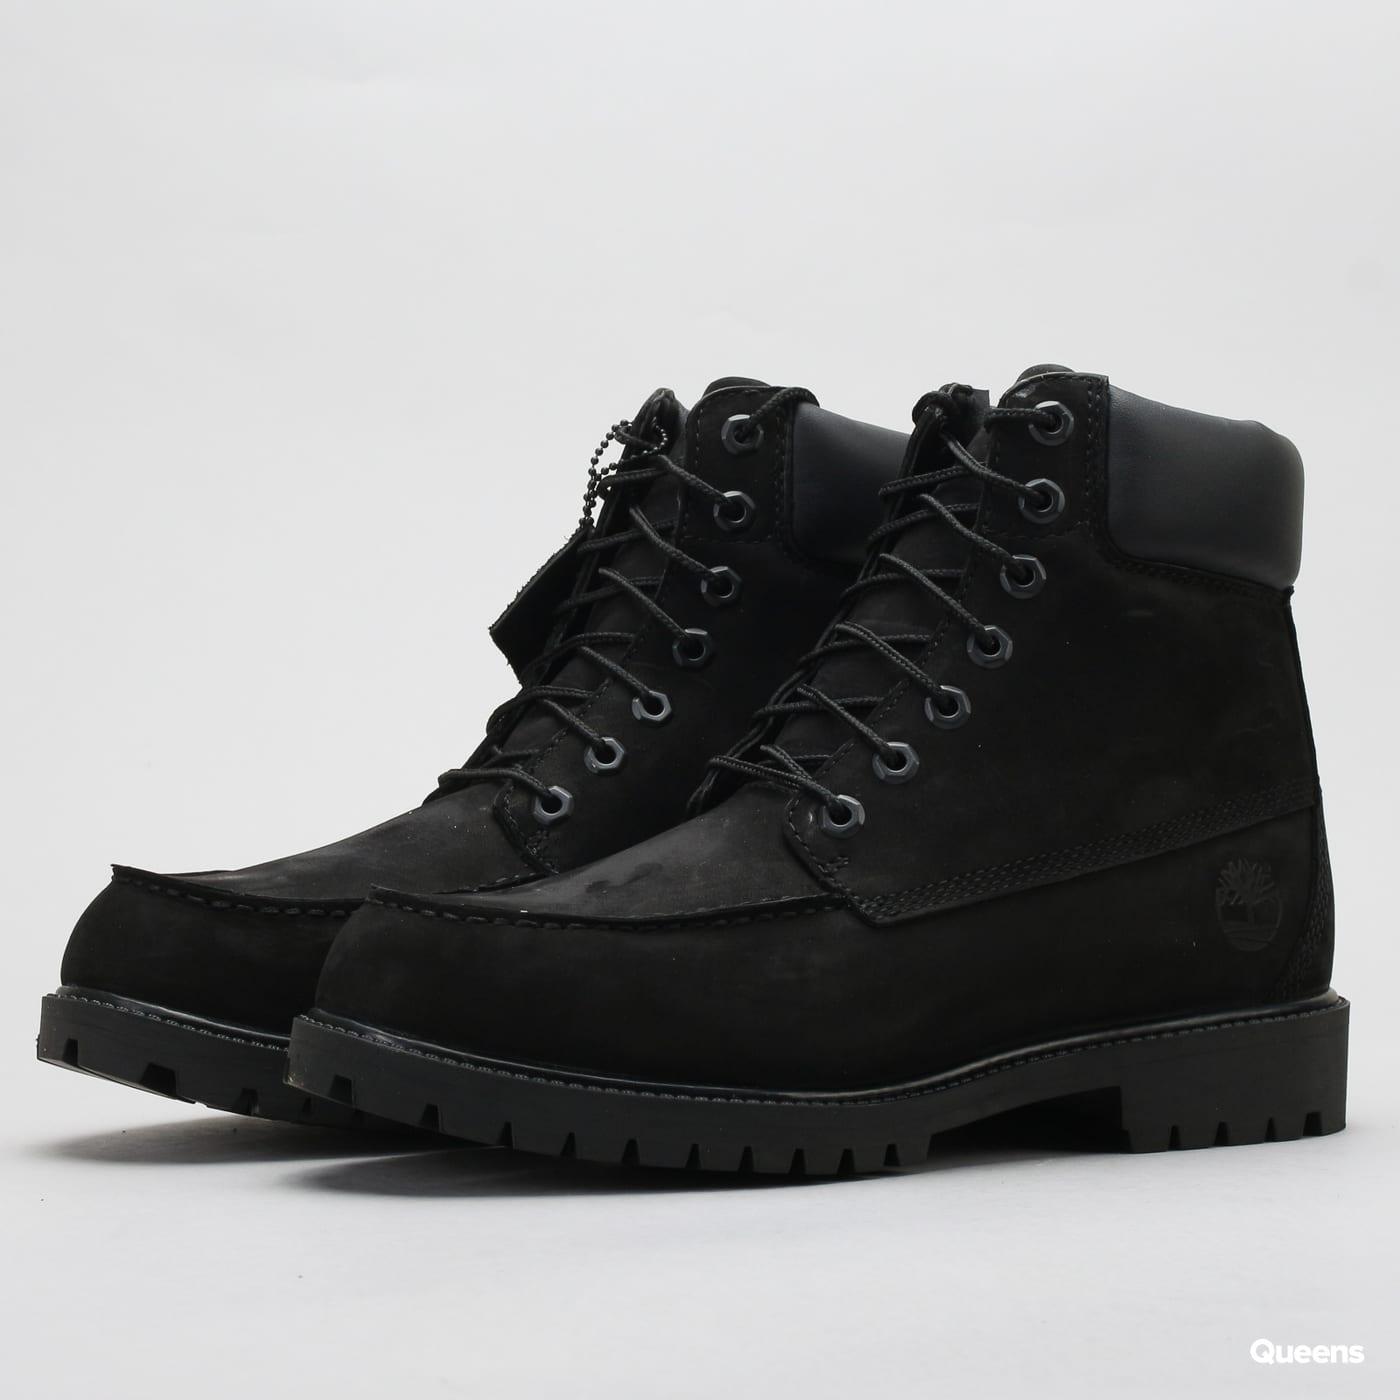 55546e988e2a6 Pánska zimná obuv Timberland 6 in Premium WP MT Boot black waterbuck  (A1M8L-BLK) – Queens 💚